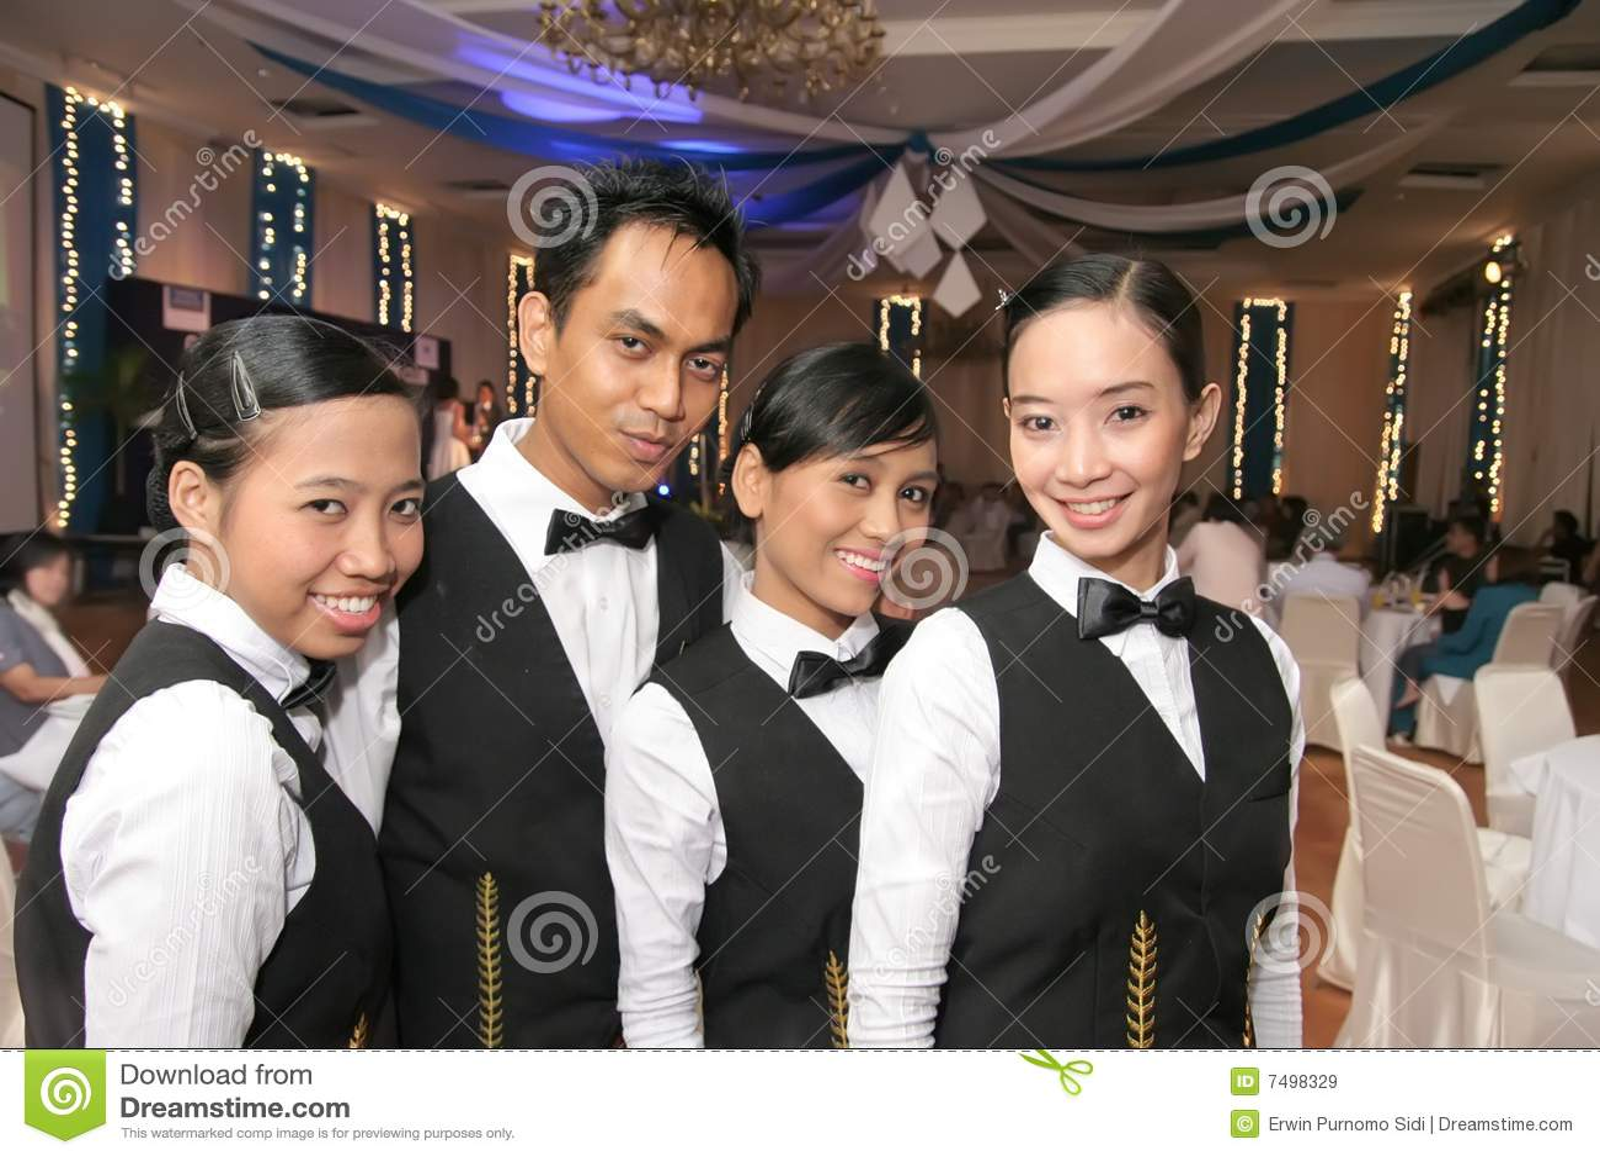 Waitress in uniform